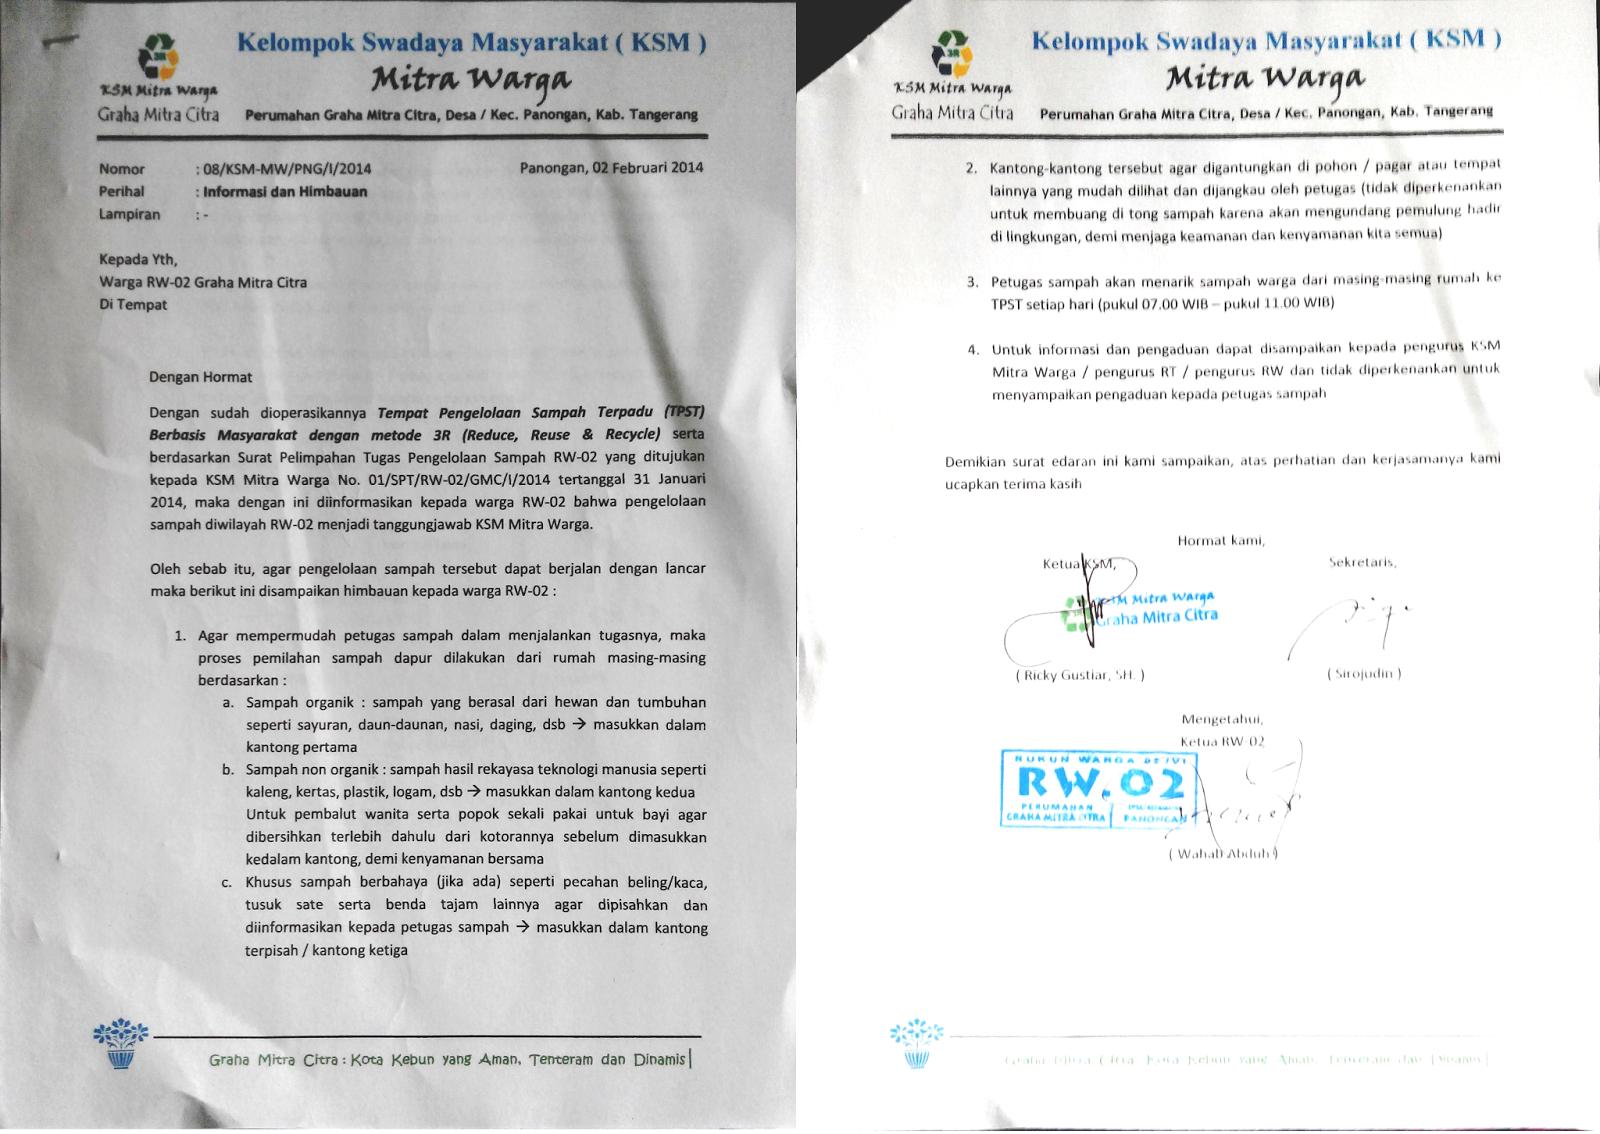 TPST 3R Mitra Warga GMC: Alur Kerja Baku Petugas di TPST